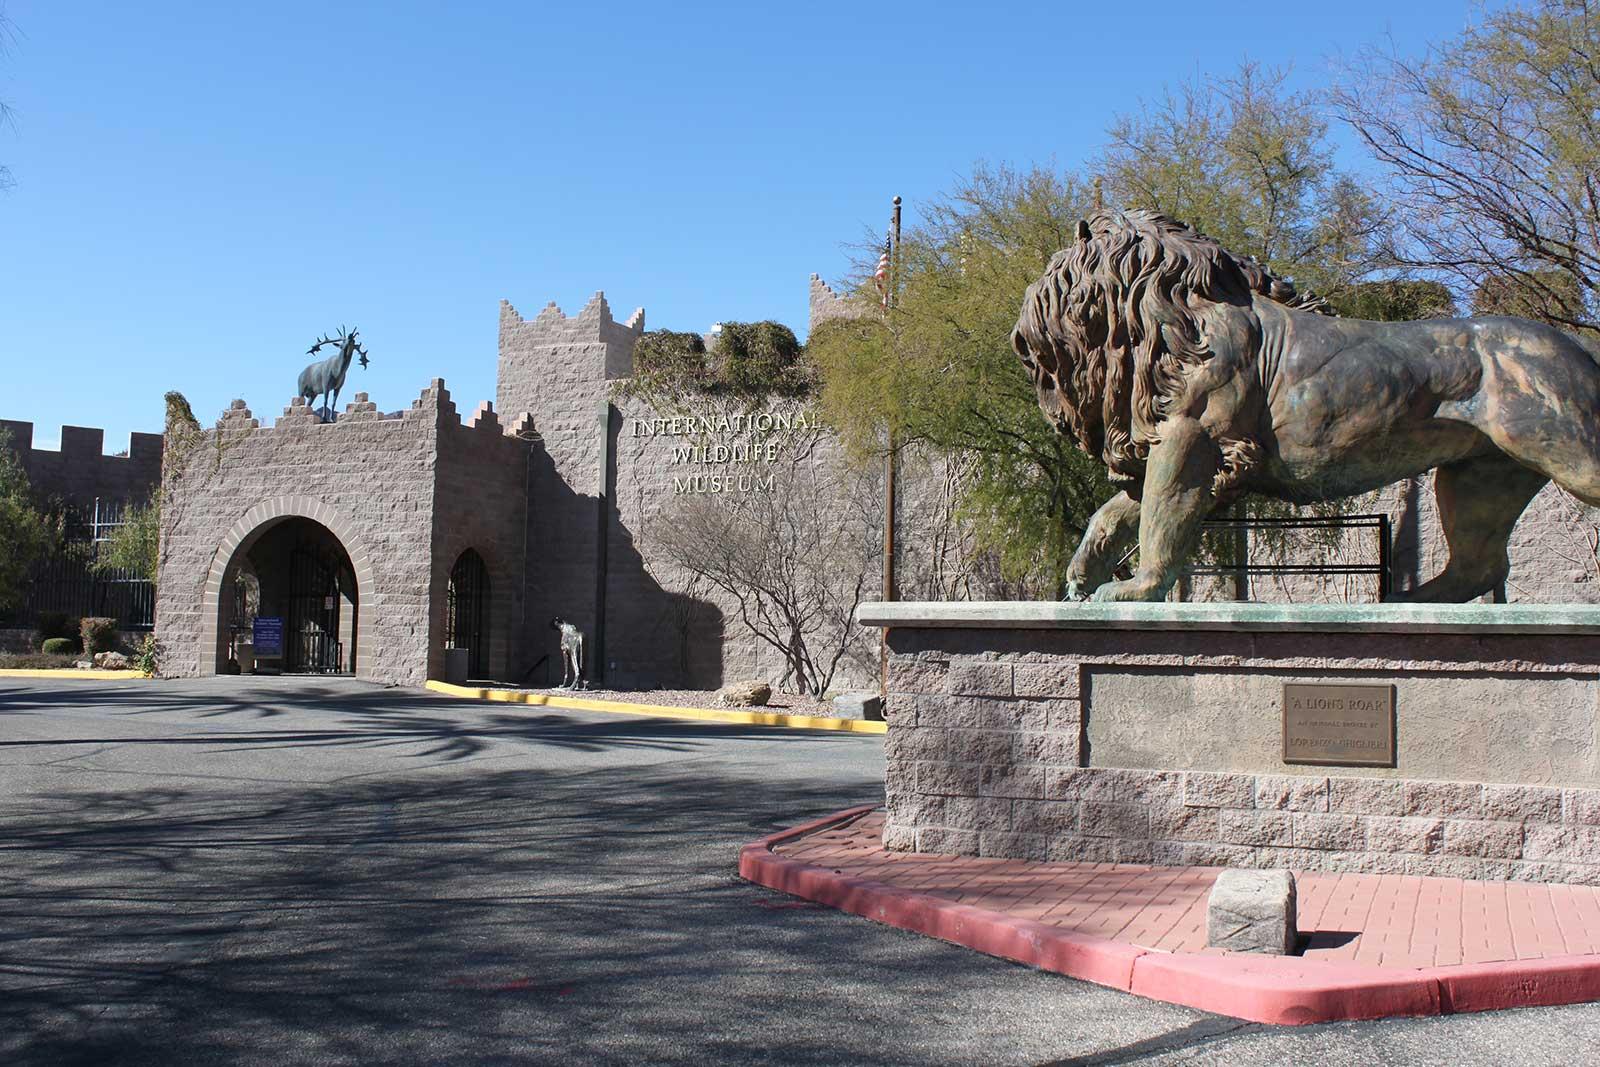 International Wildlife Museum Tucson Attractions